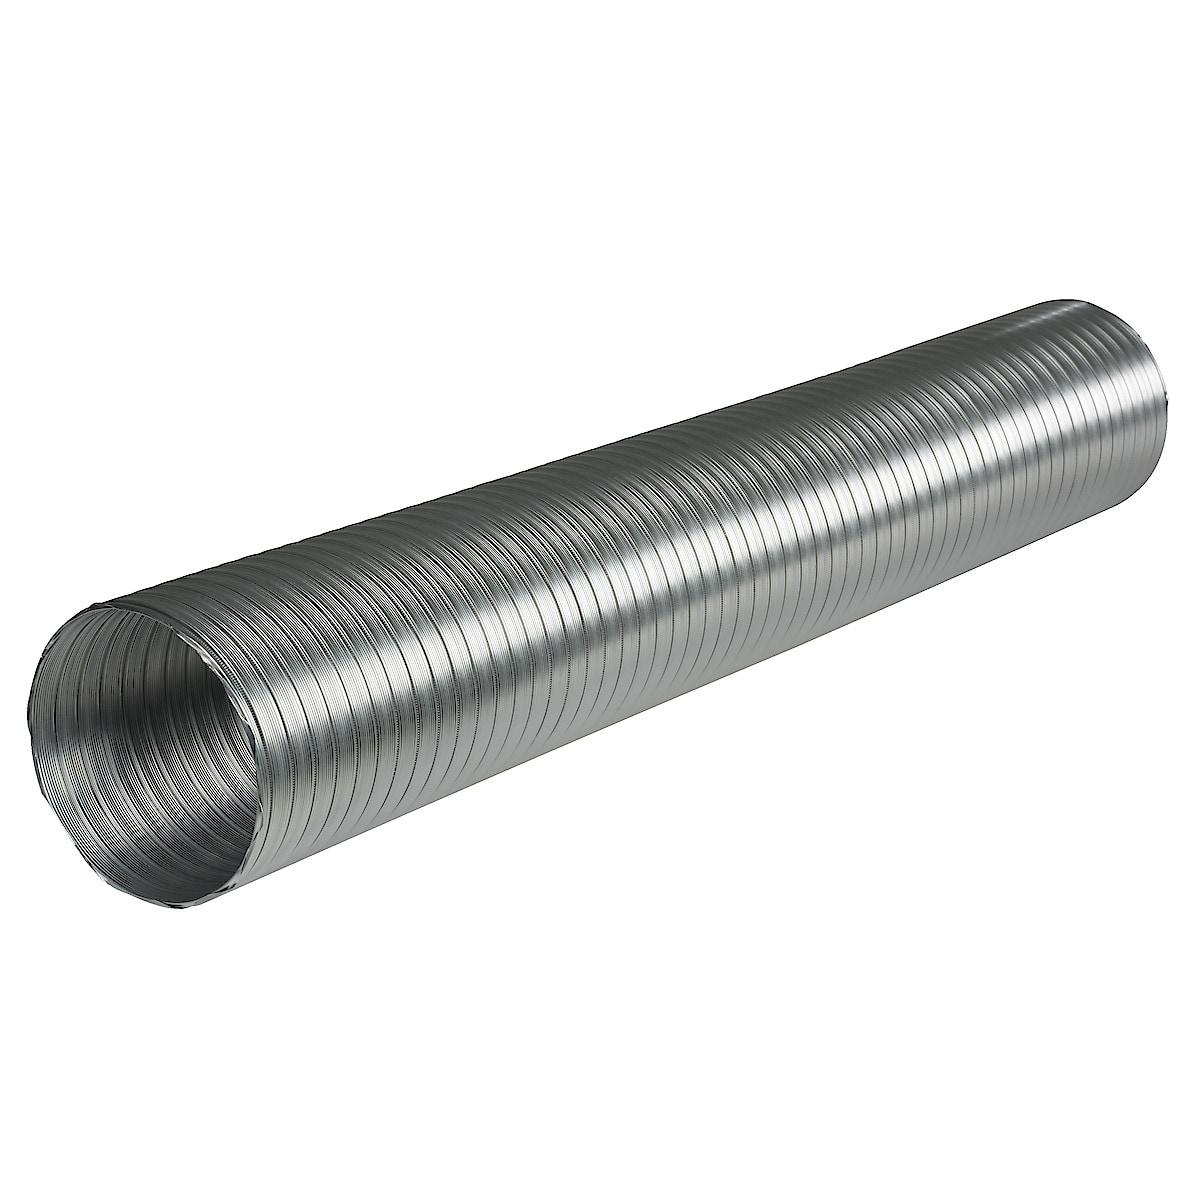 Flexibel ventilationsslang